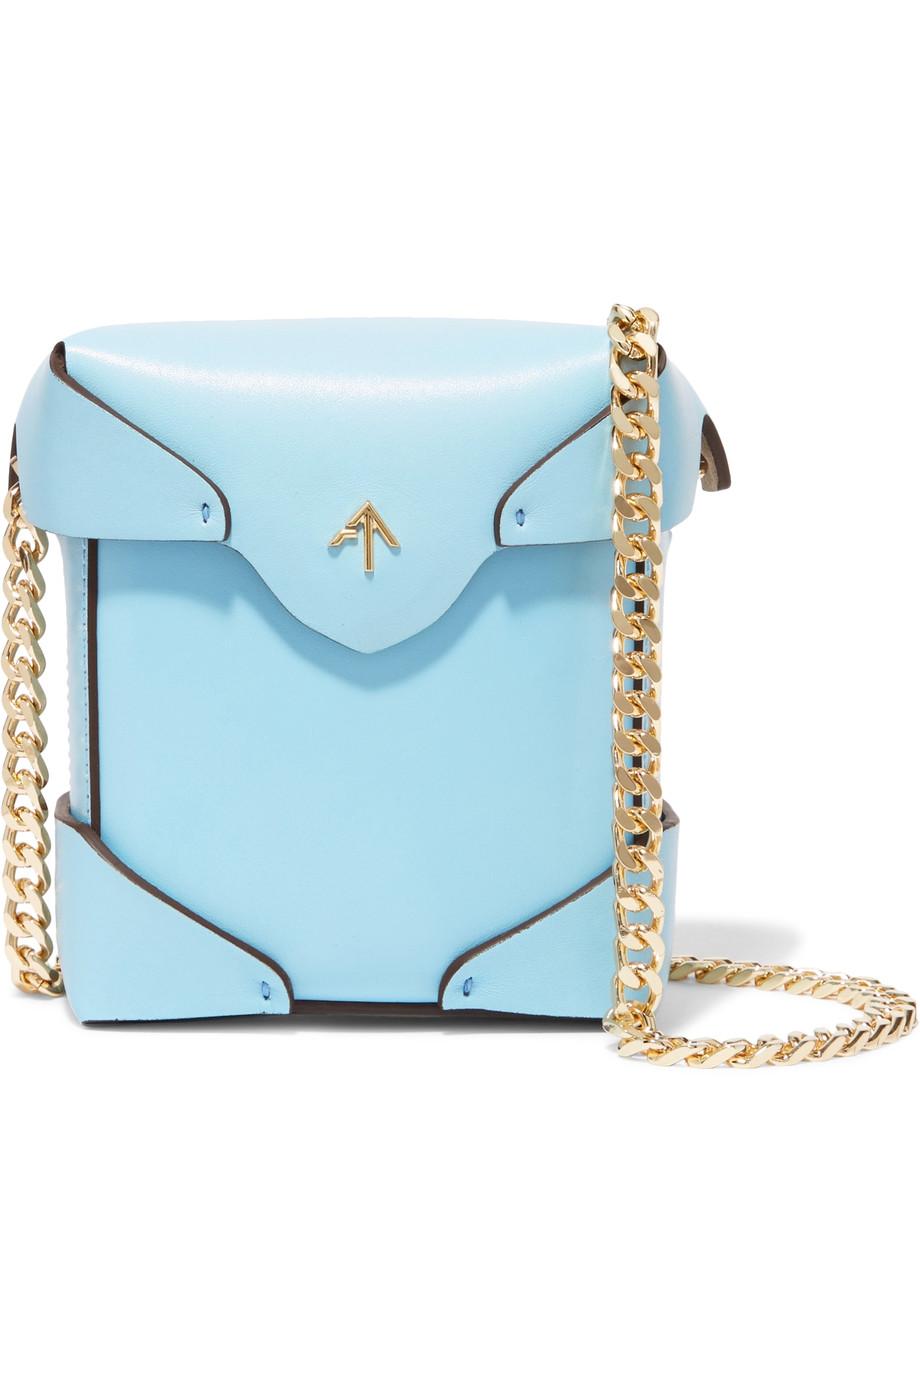 Manu Atelier  Pristine Mico Leather Bag  ($420)